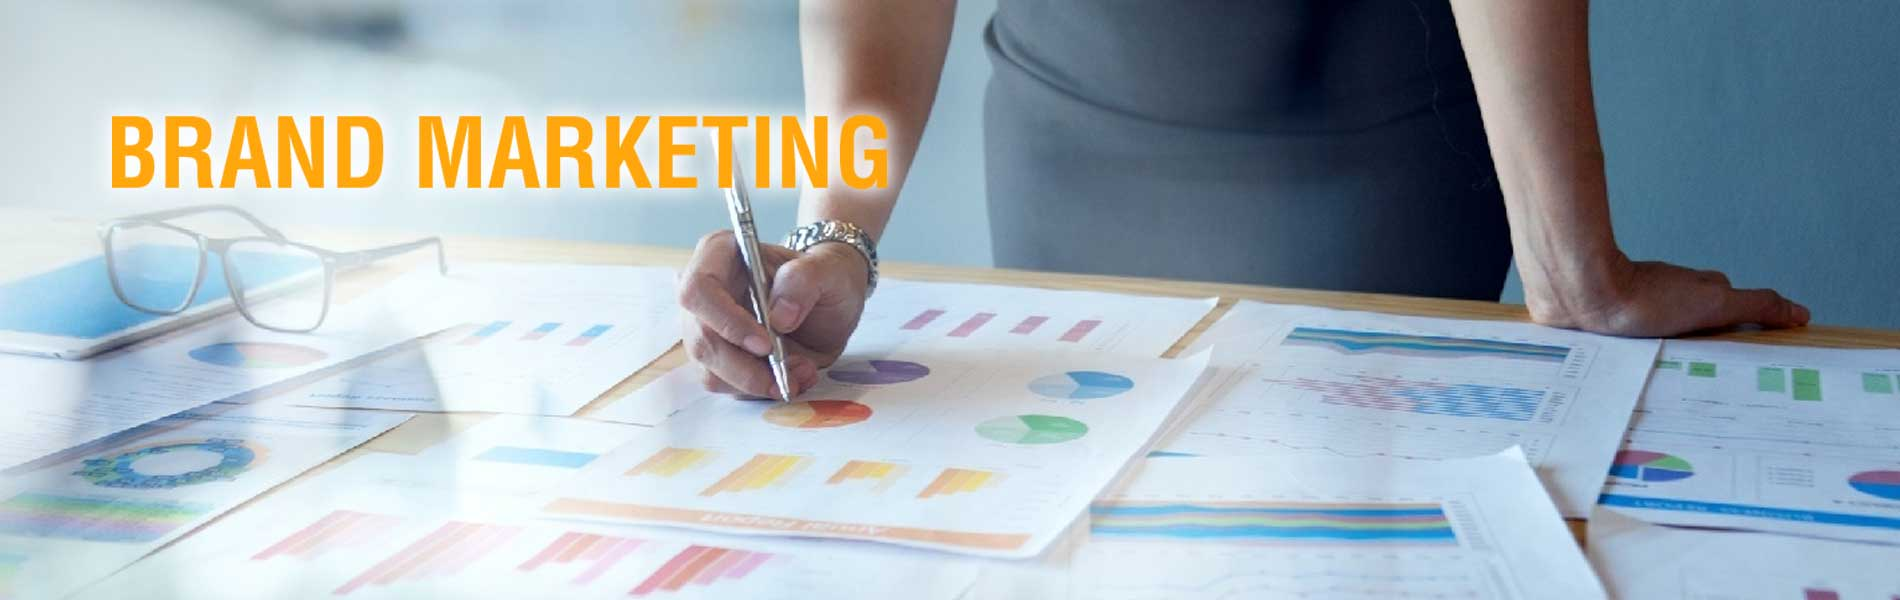 2021_tnn_team_brand_marketing